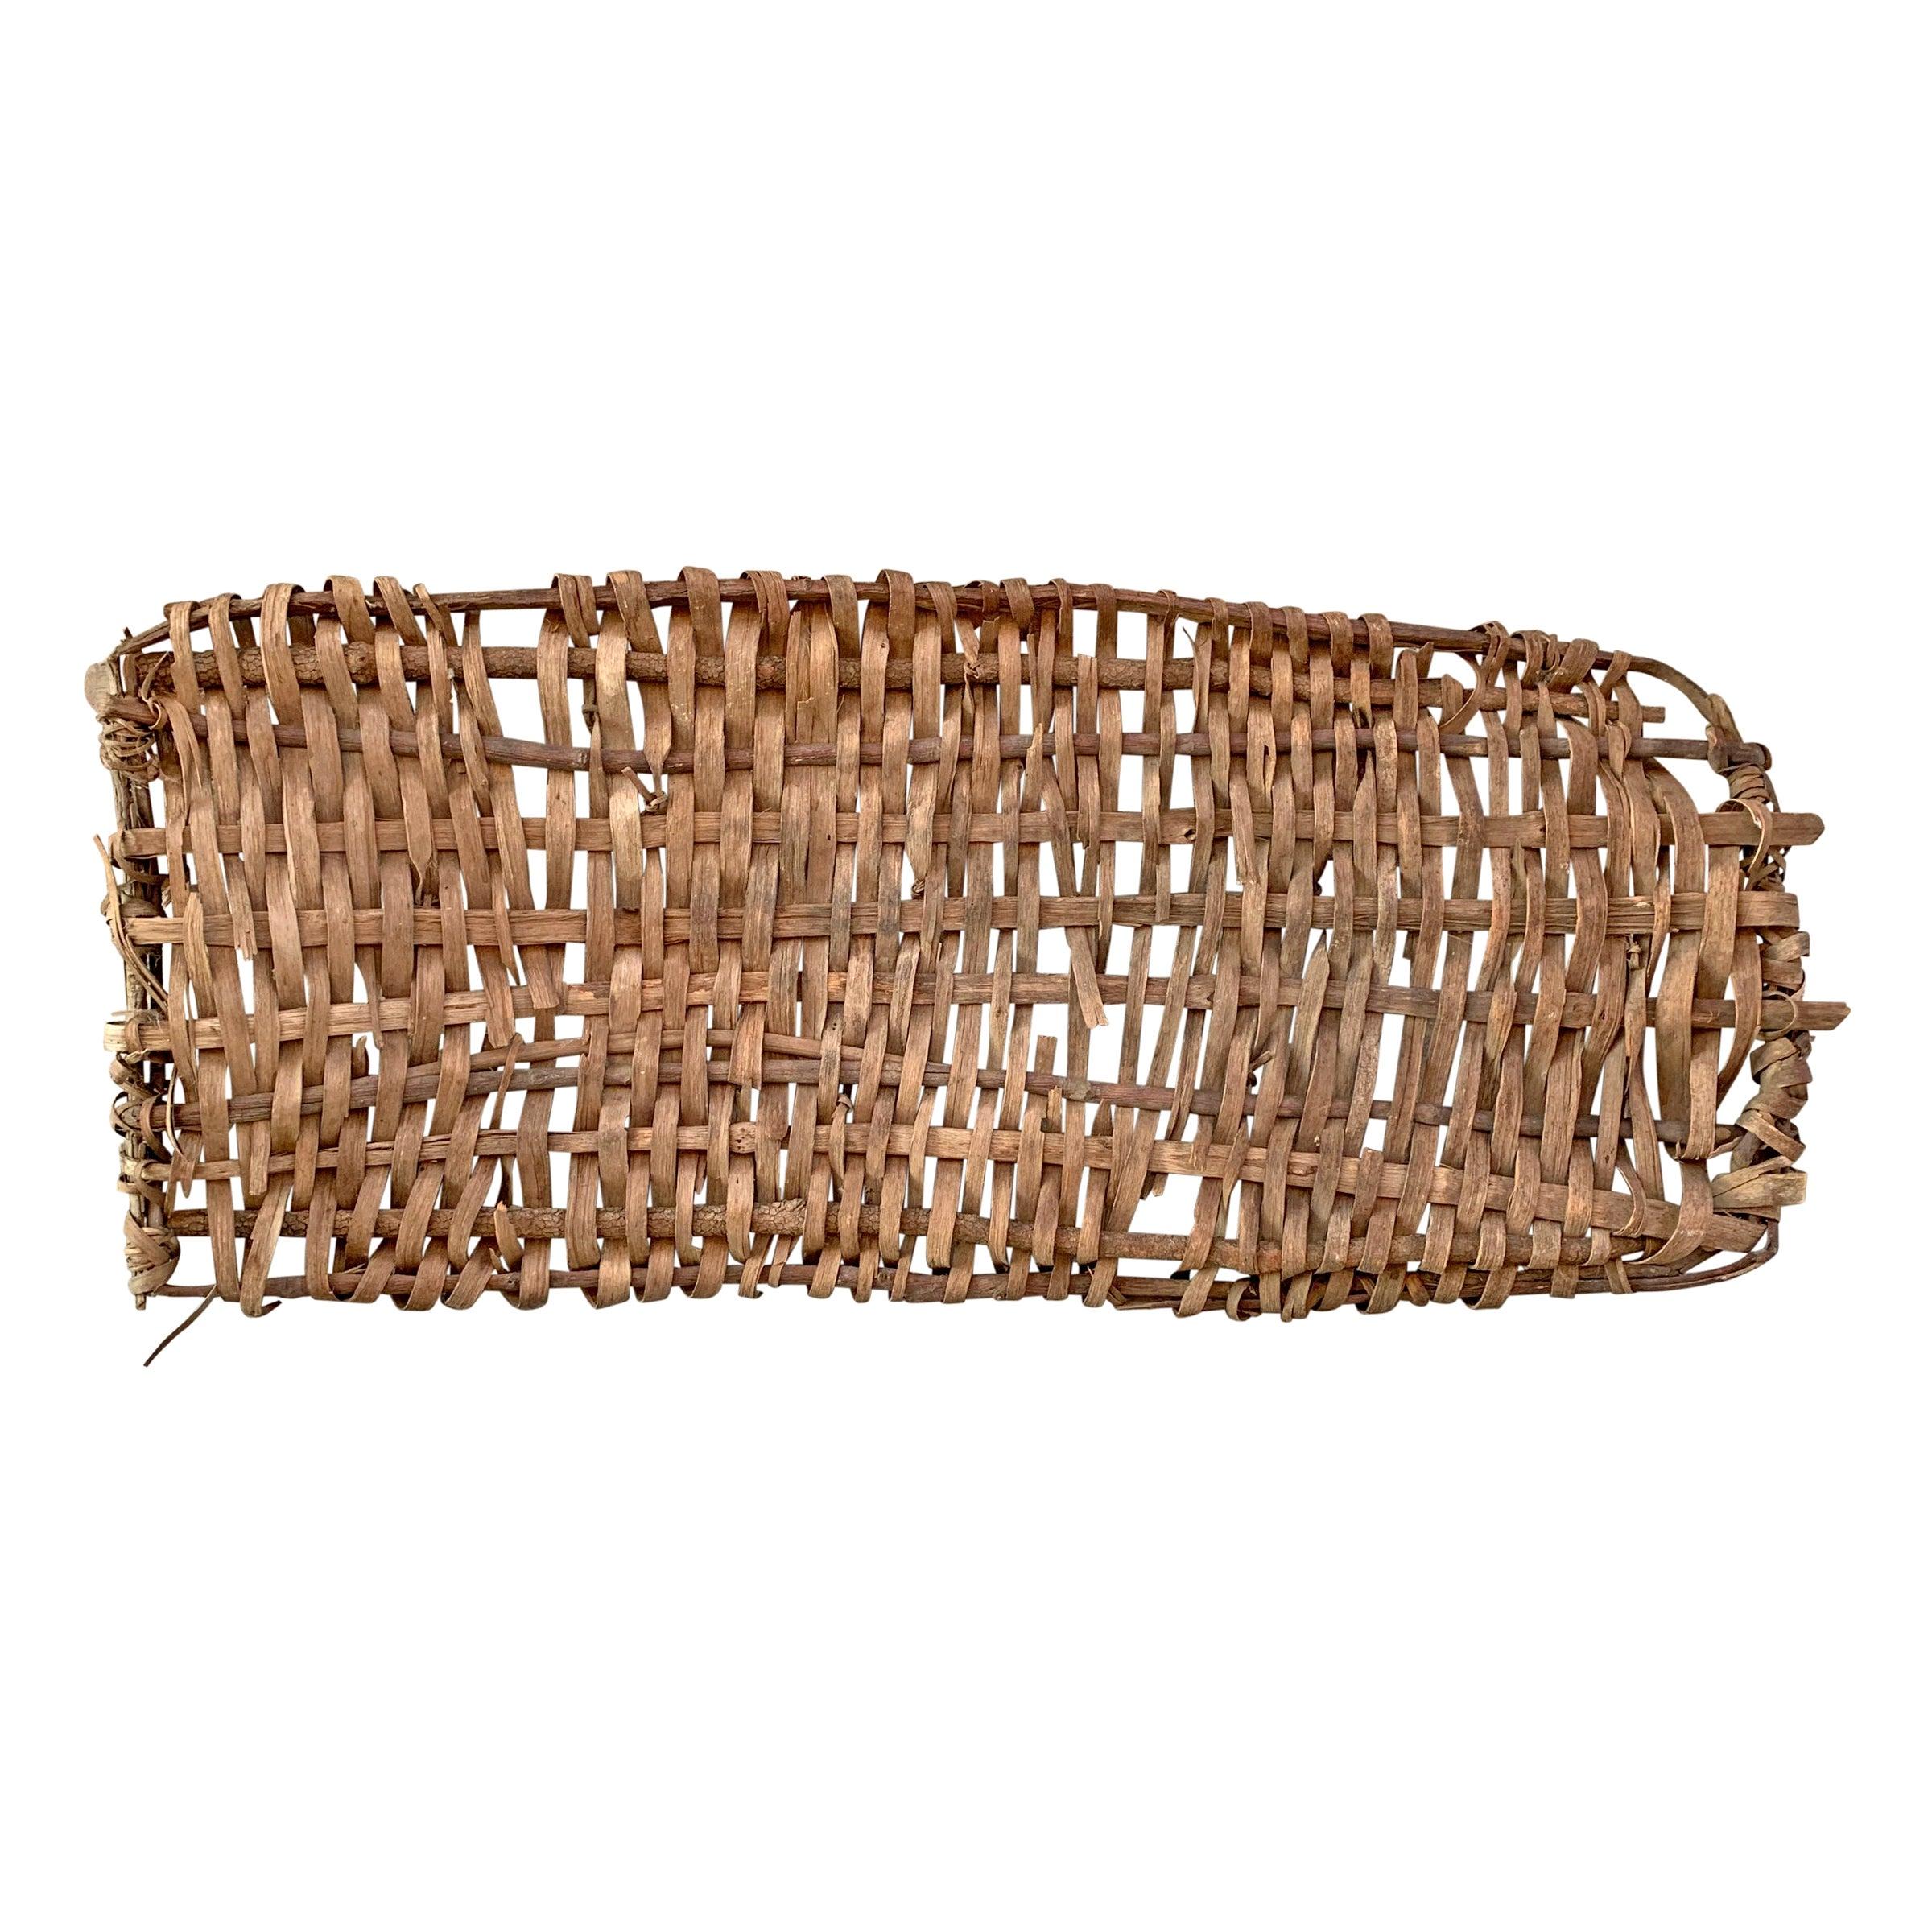 19th Century American Drying Basket